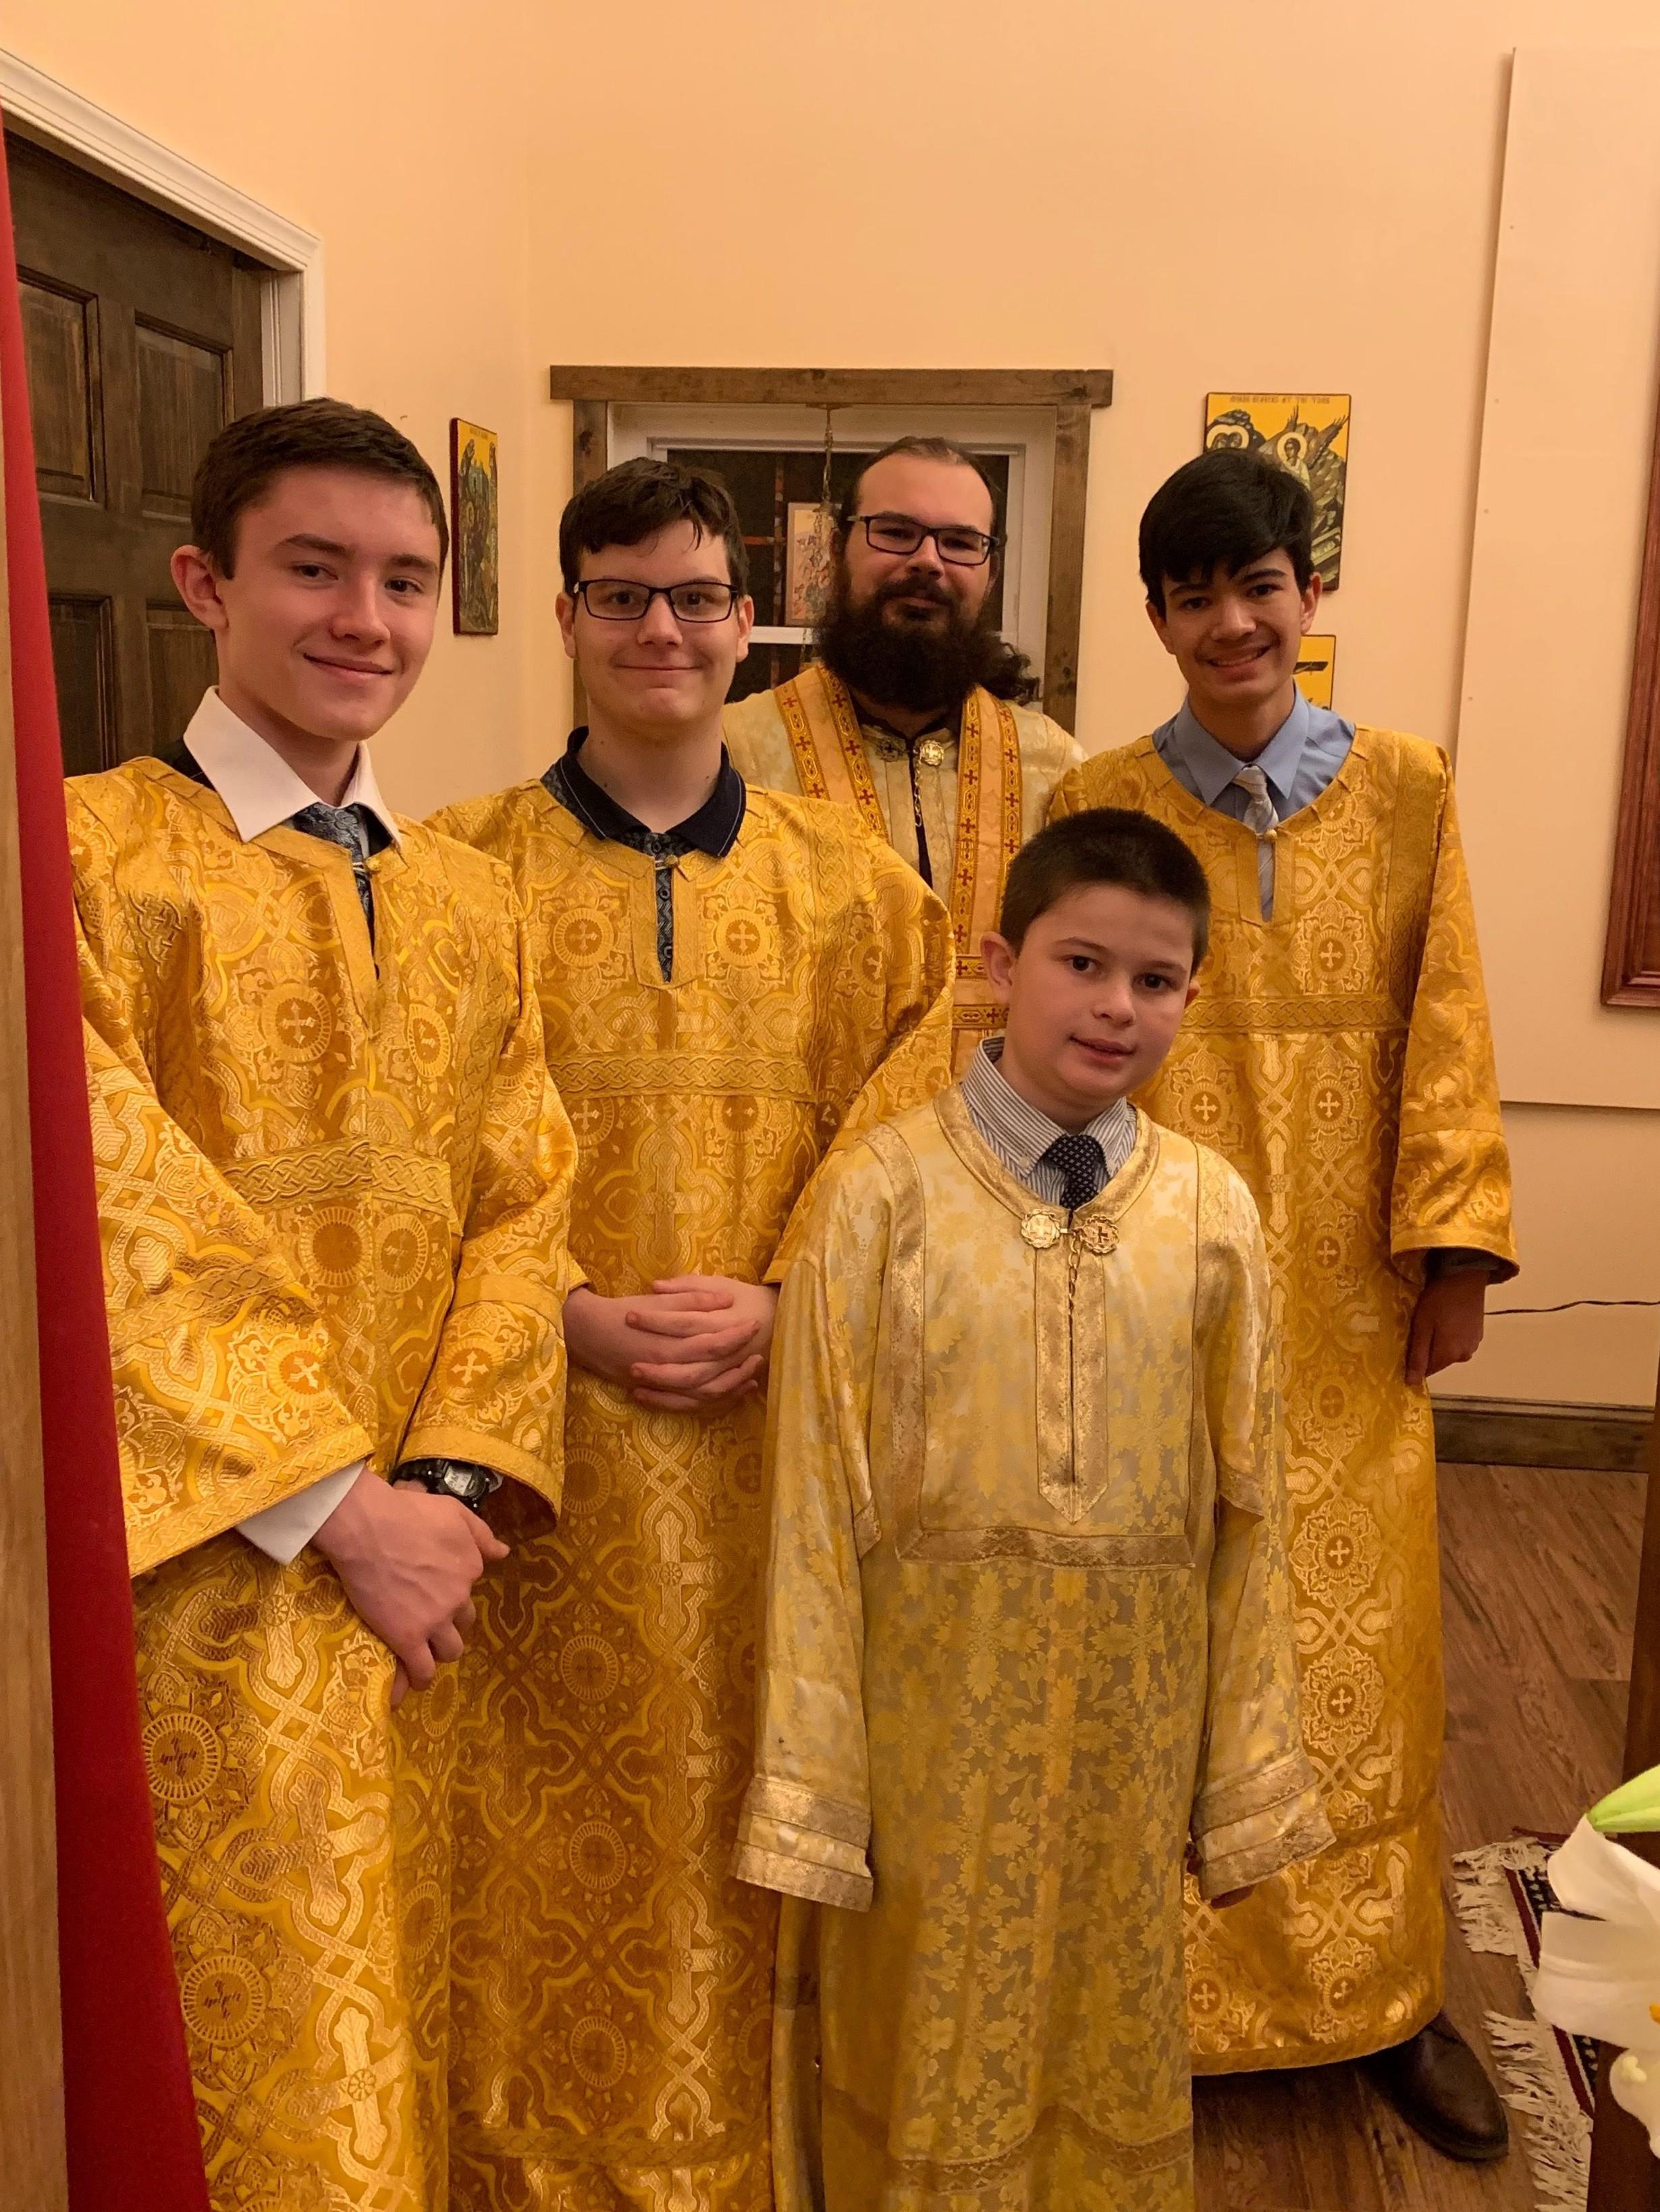 Subdeacon Nicholas Czumak and altar servers